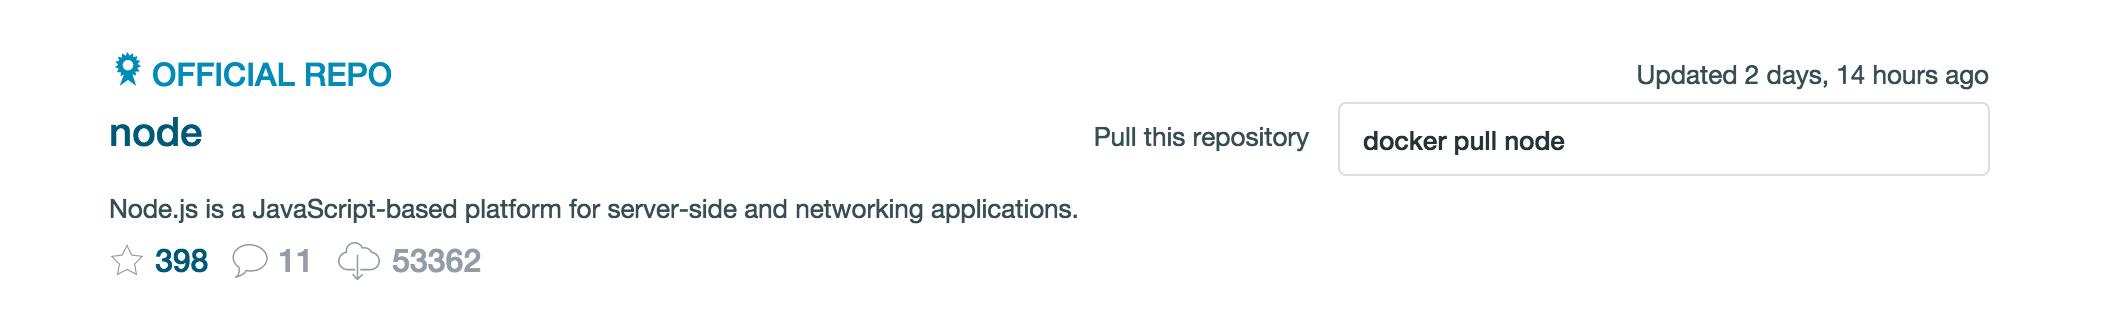 Node.js on Docker Hub